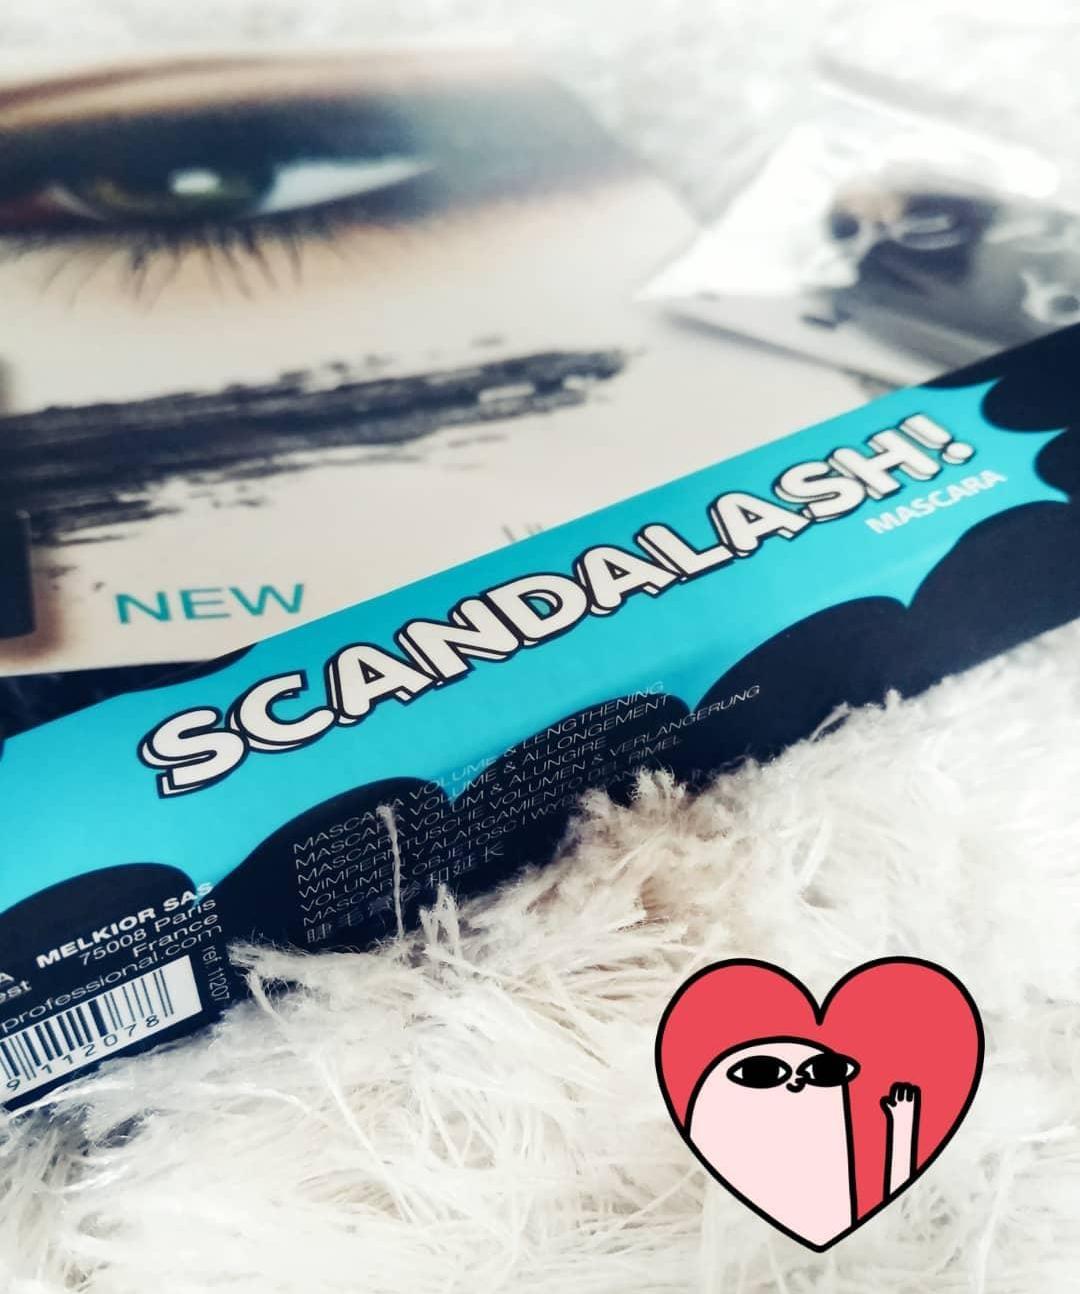 Mascara Scandalash de la Melkior 🌸